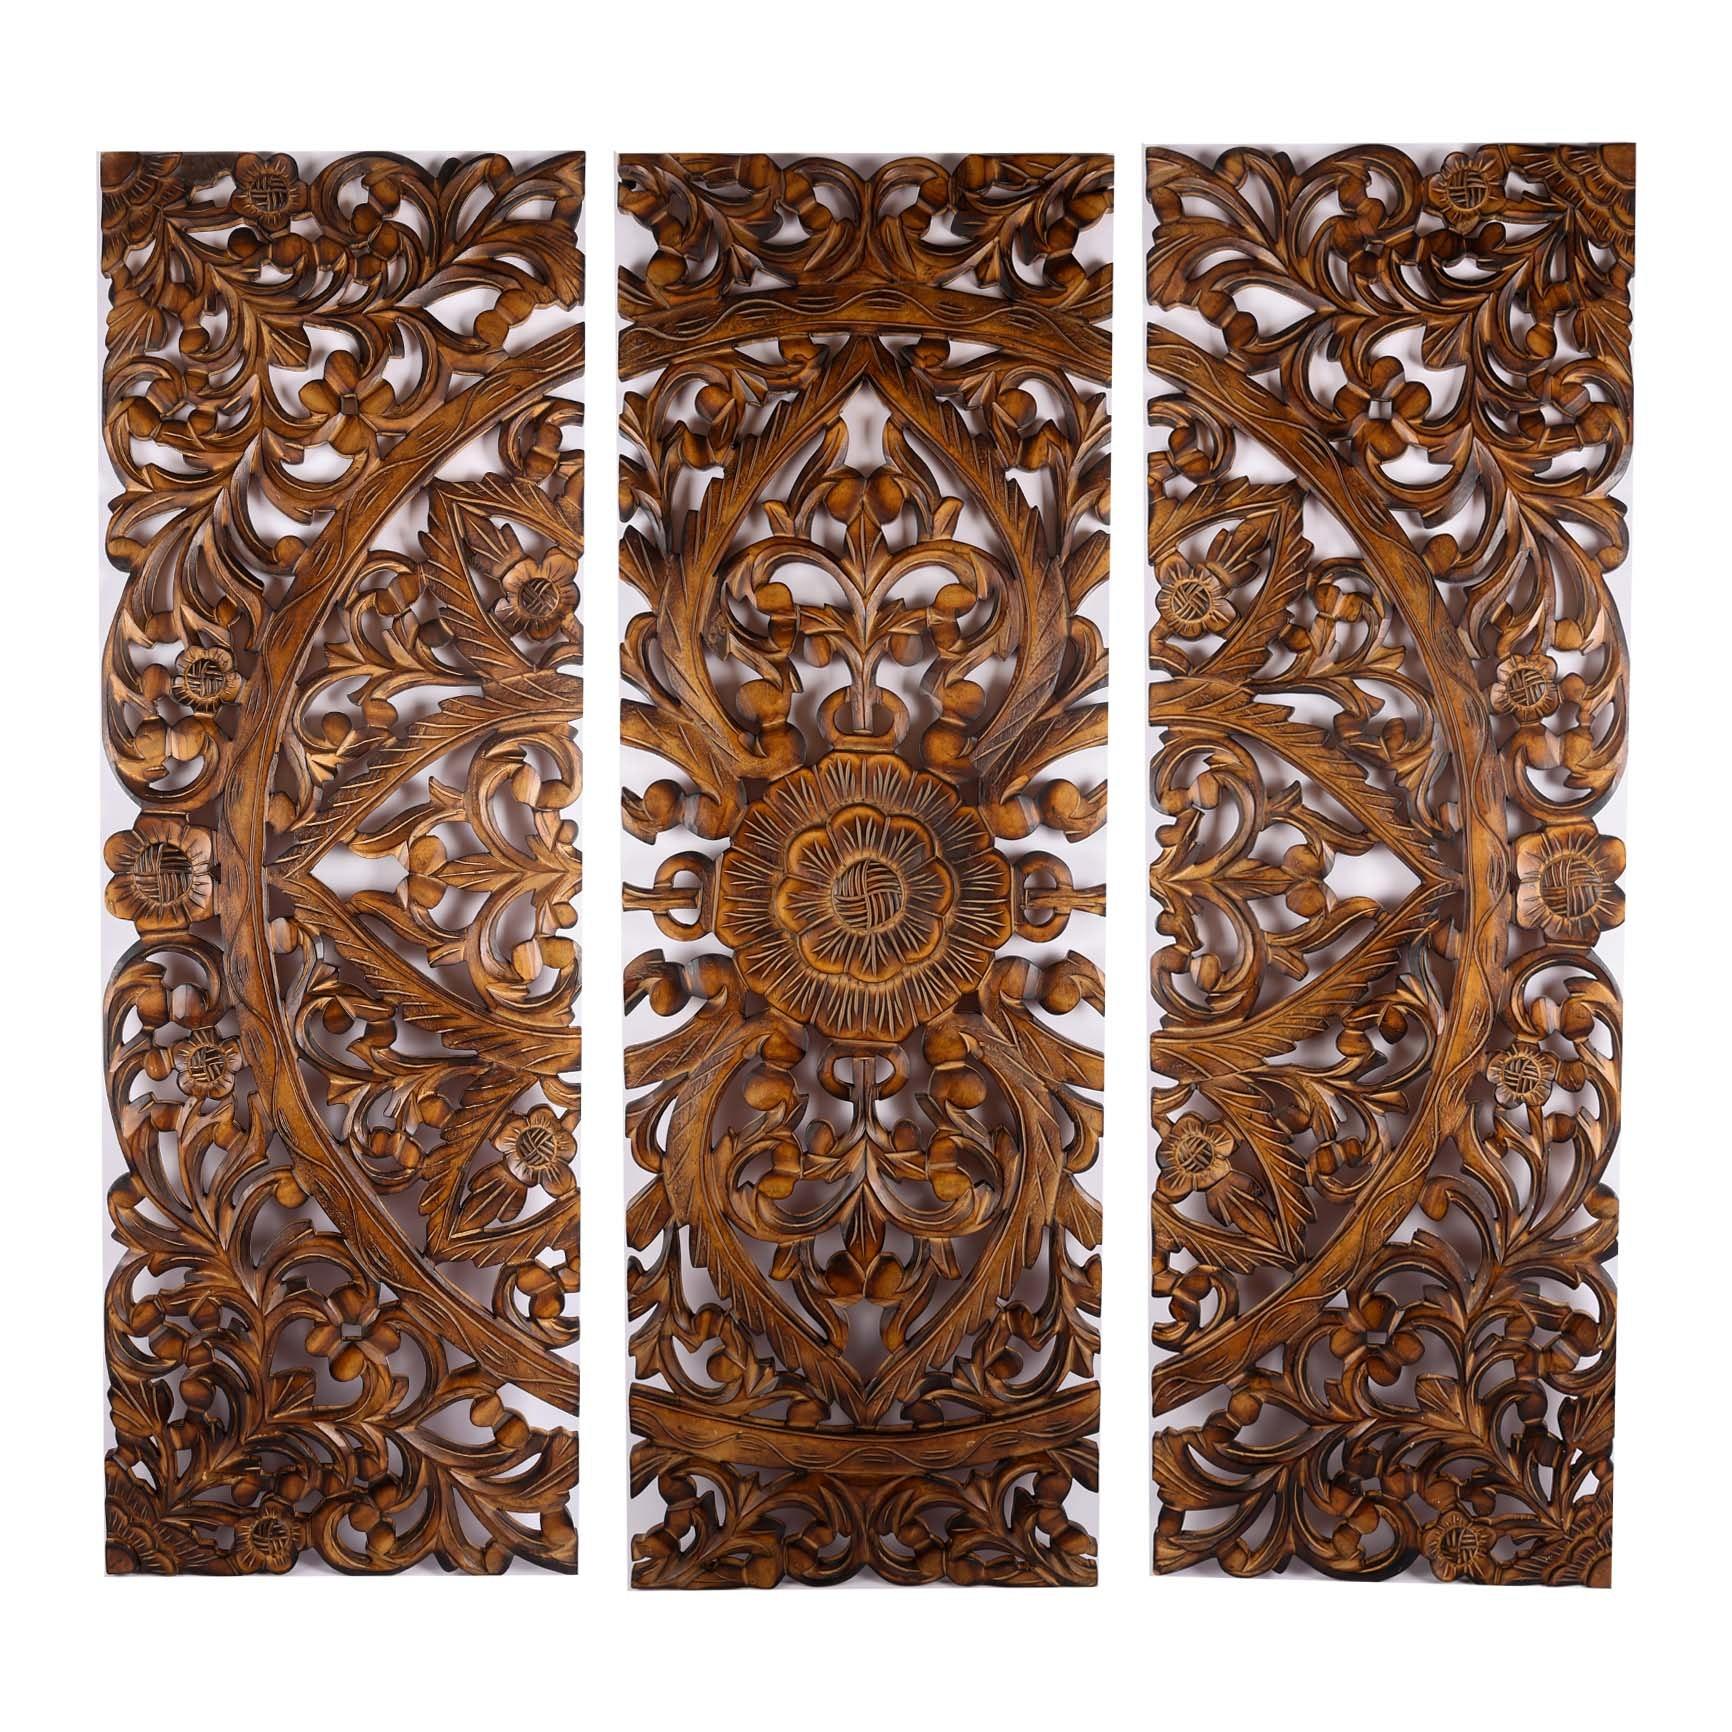 Carved Teak Triptych Panels